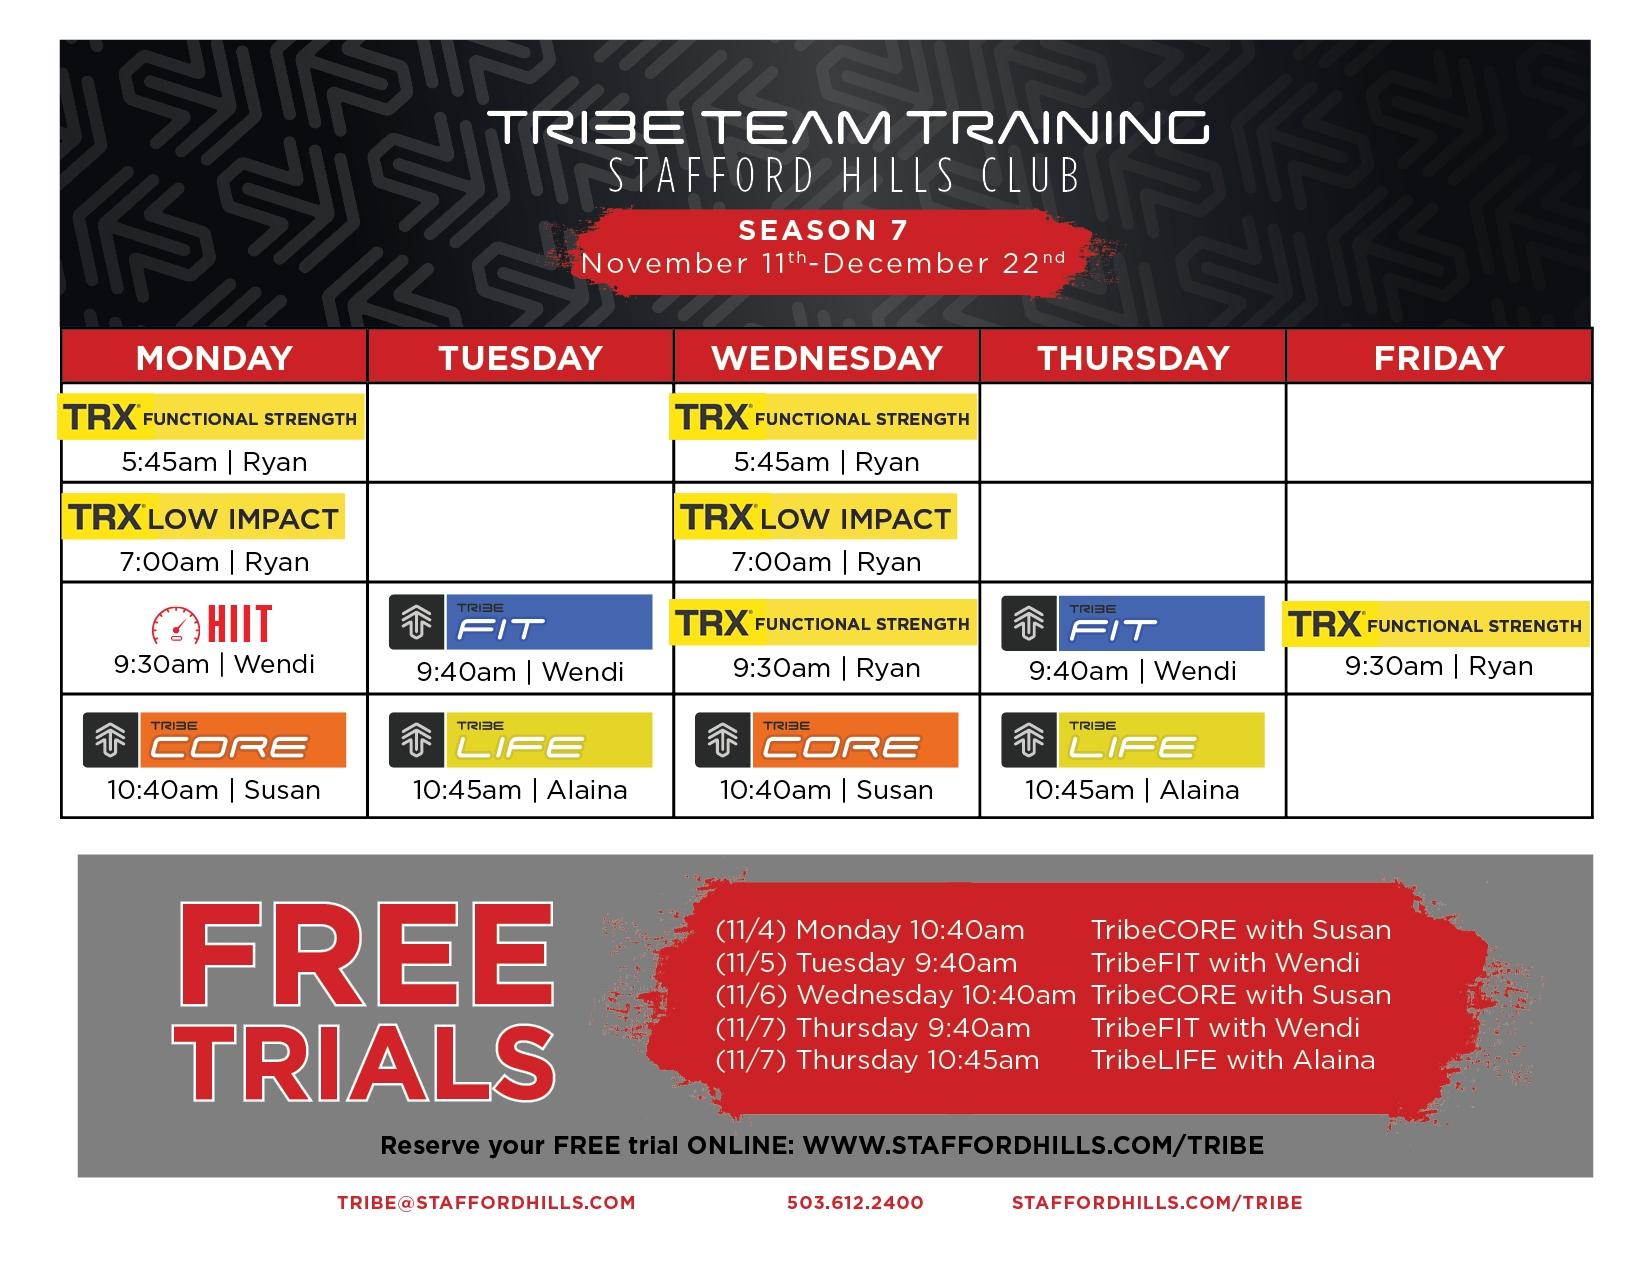 Tribe Team Training – Stafford Hills Club